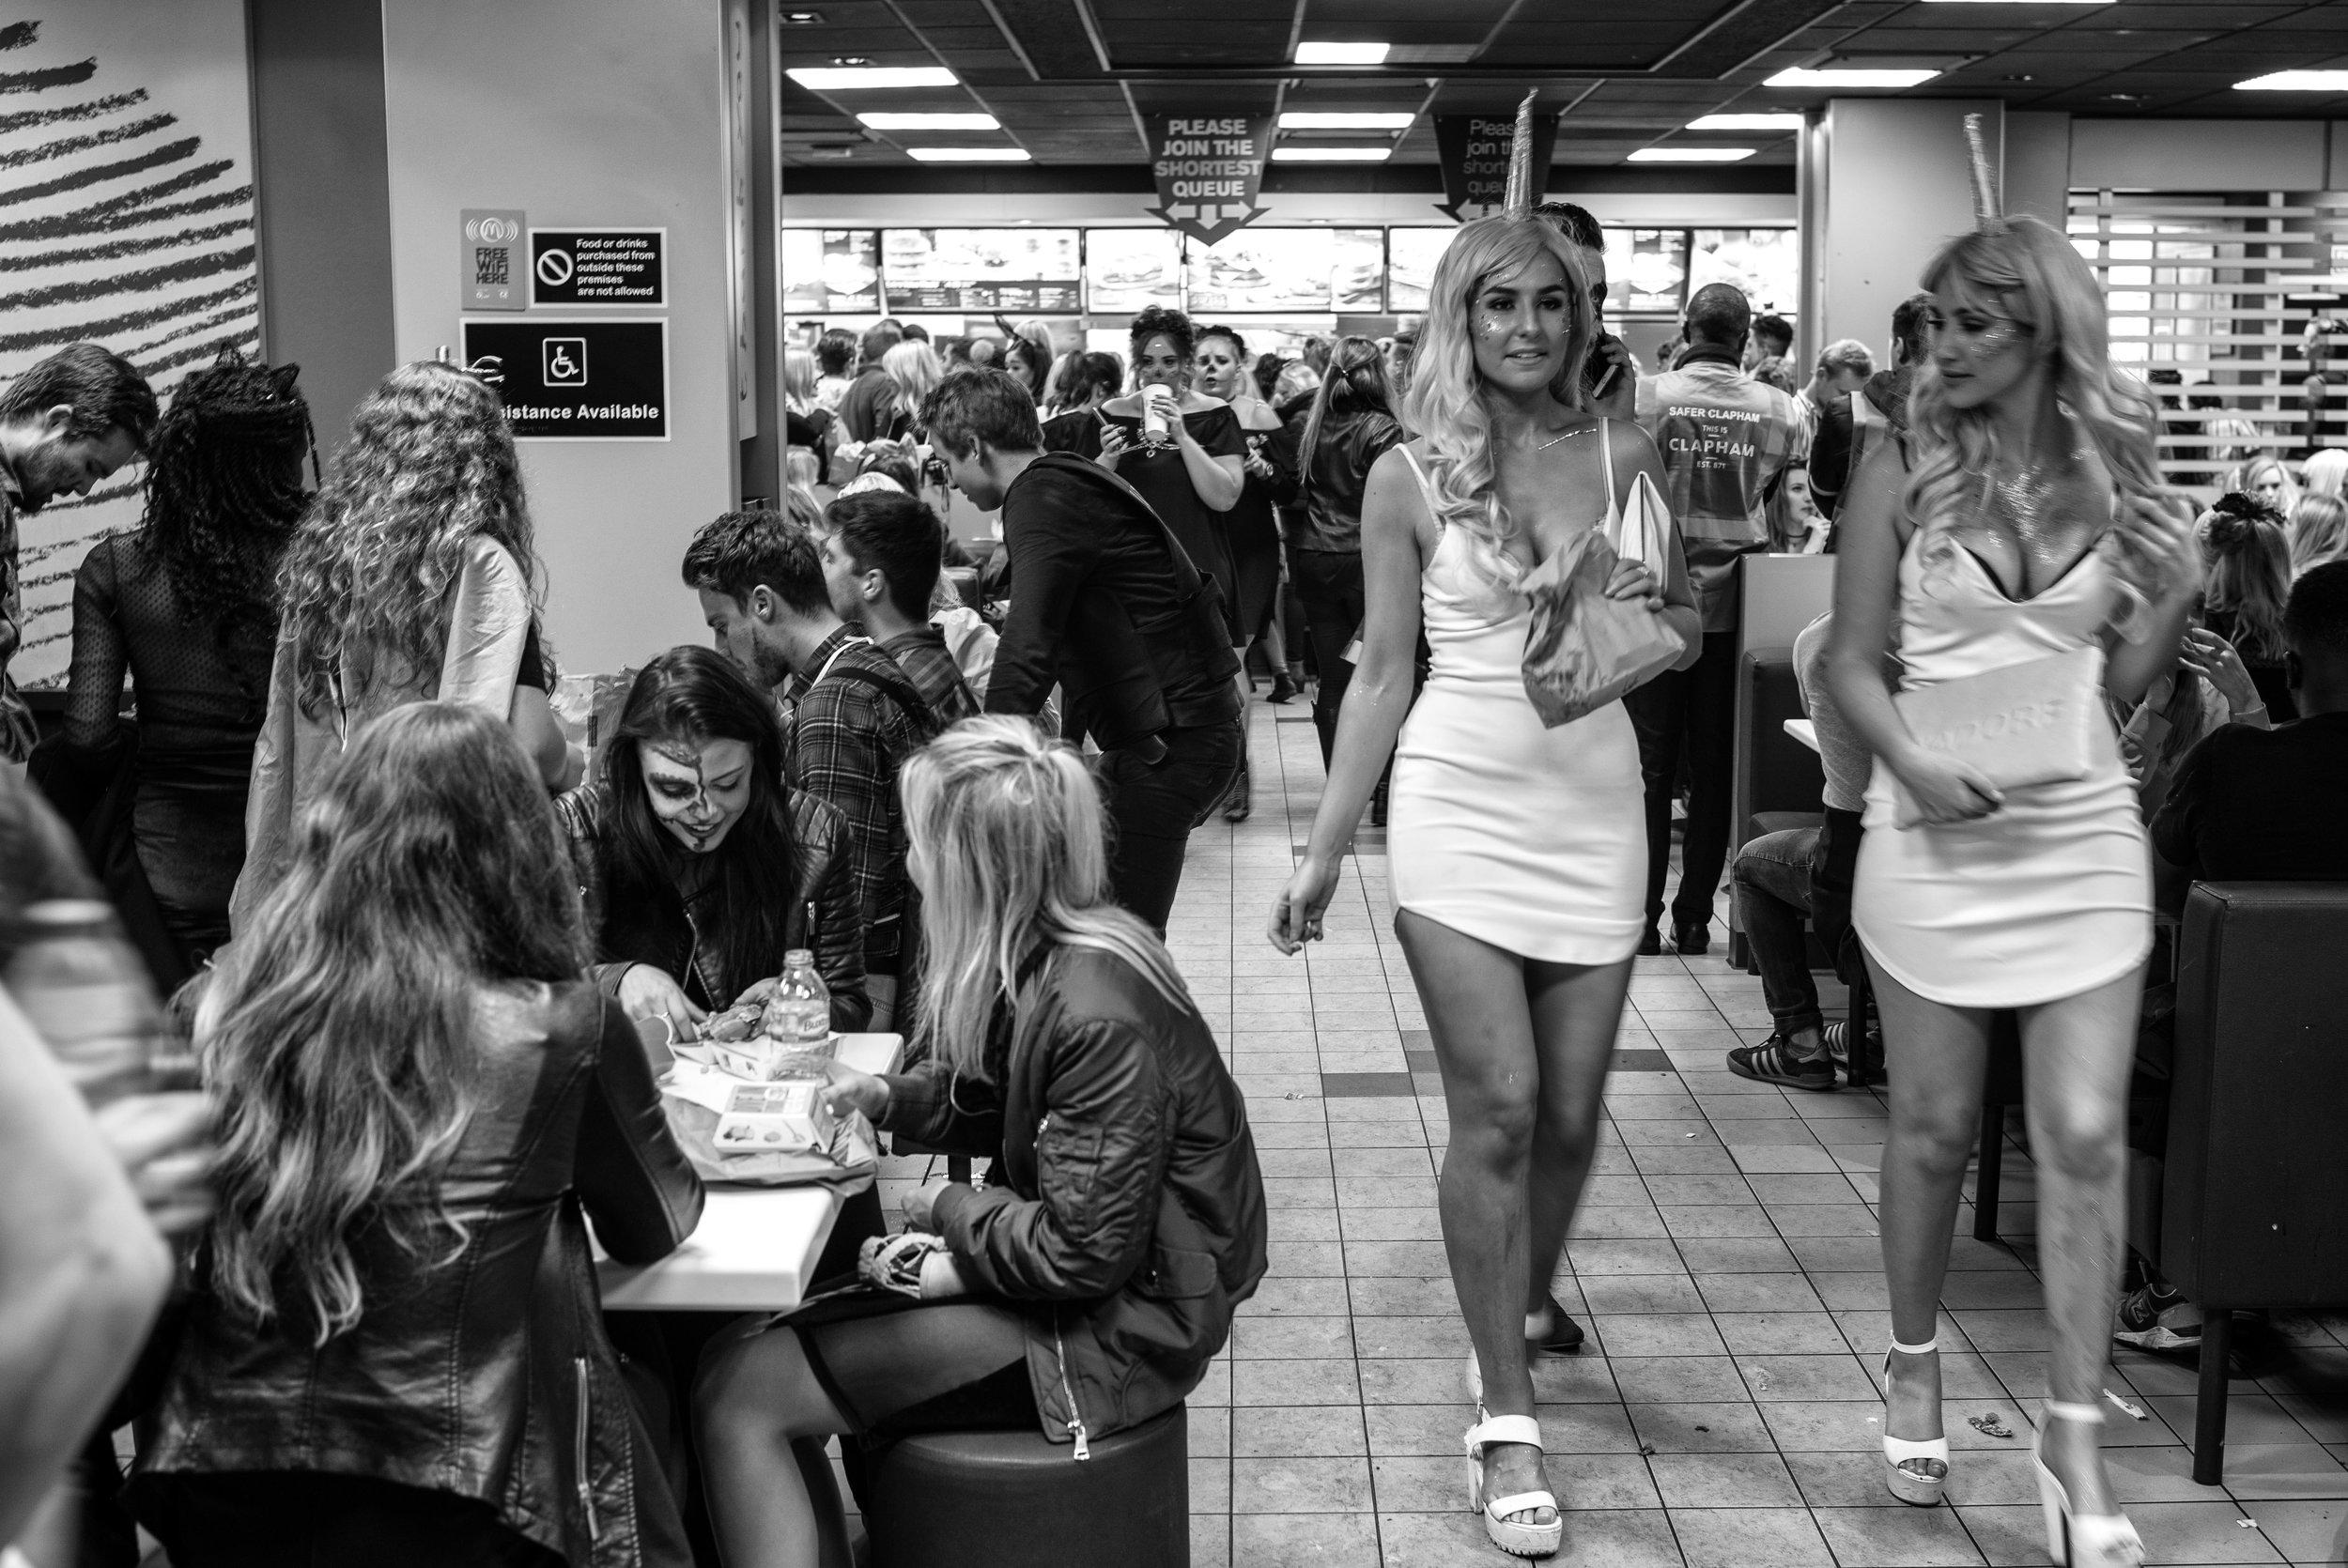 Saturday night 1.40am.  Fast food unicorns